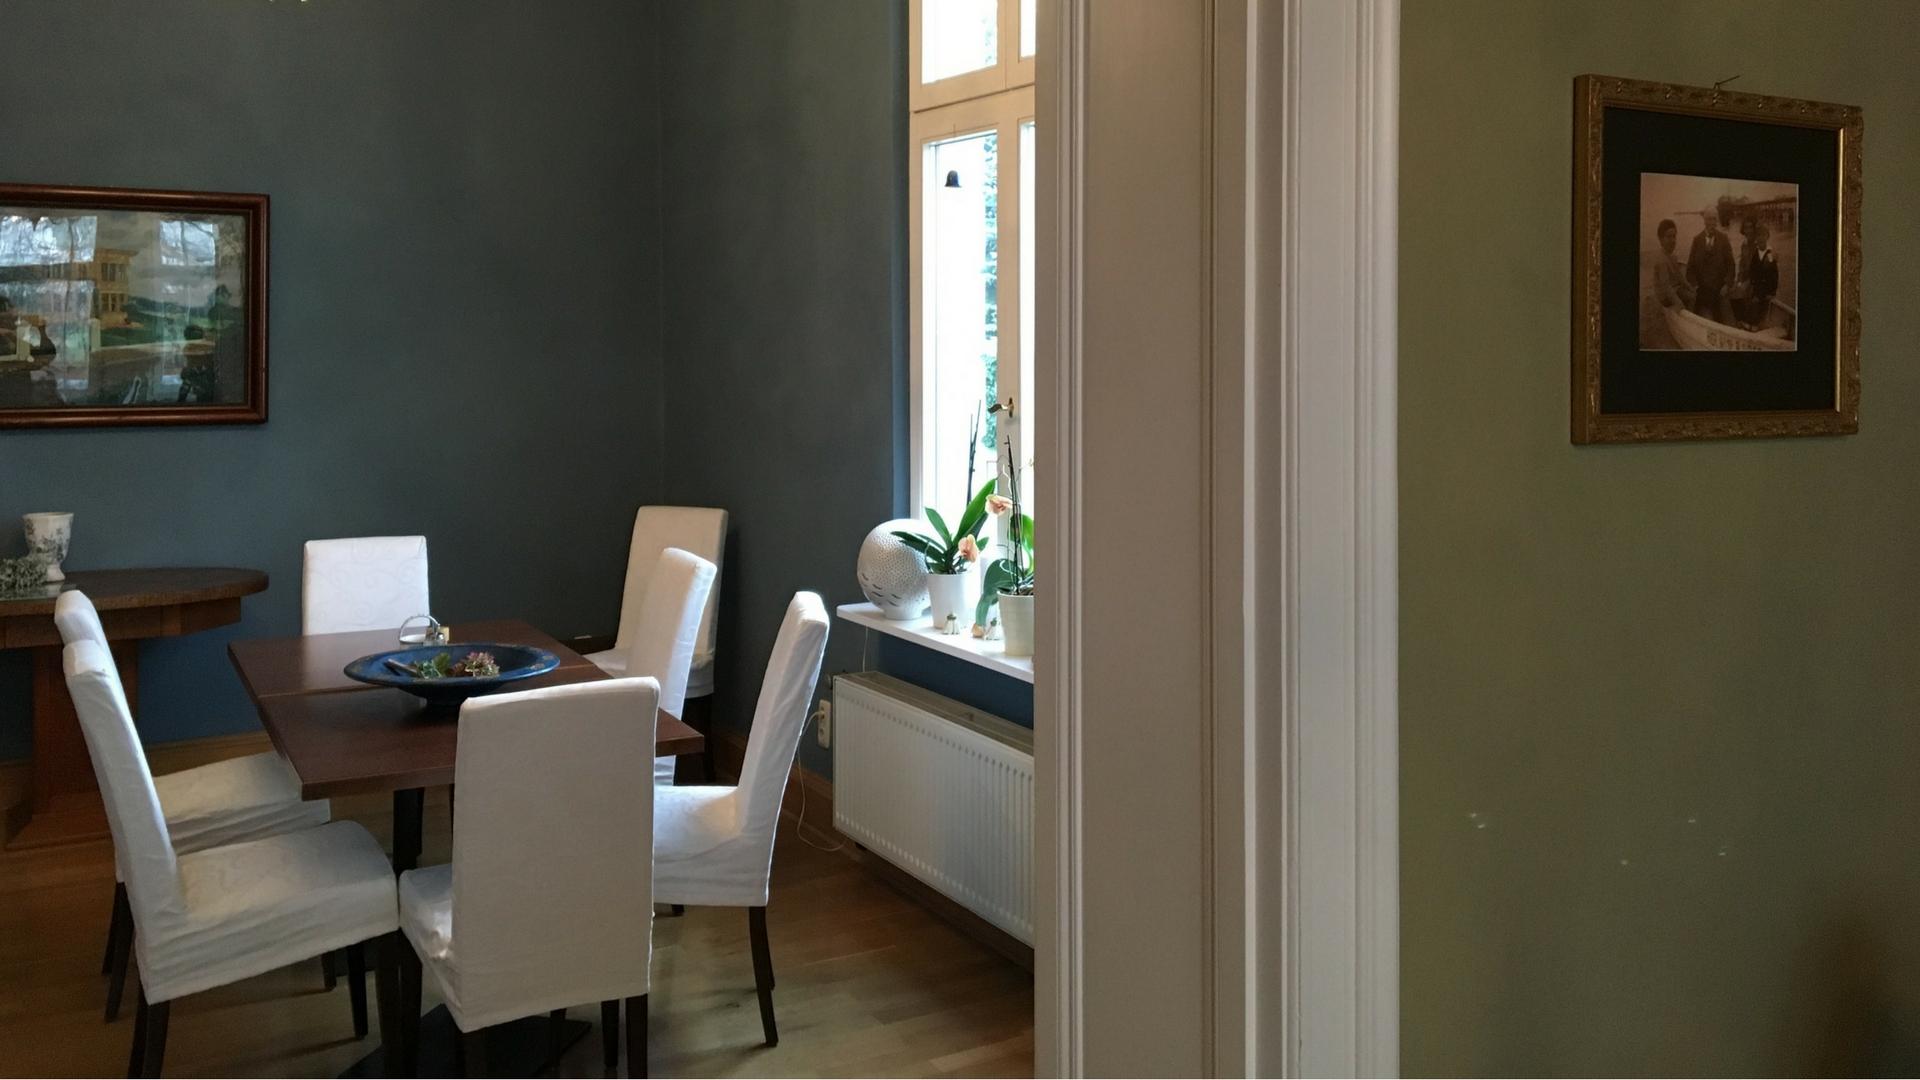 Blick in den blauen Salon der Villa Dorothea in Heringsdorf